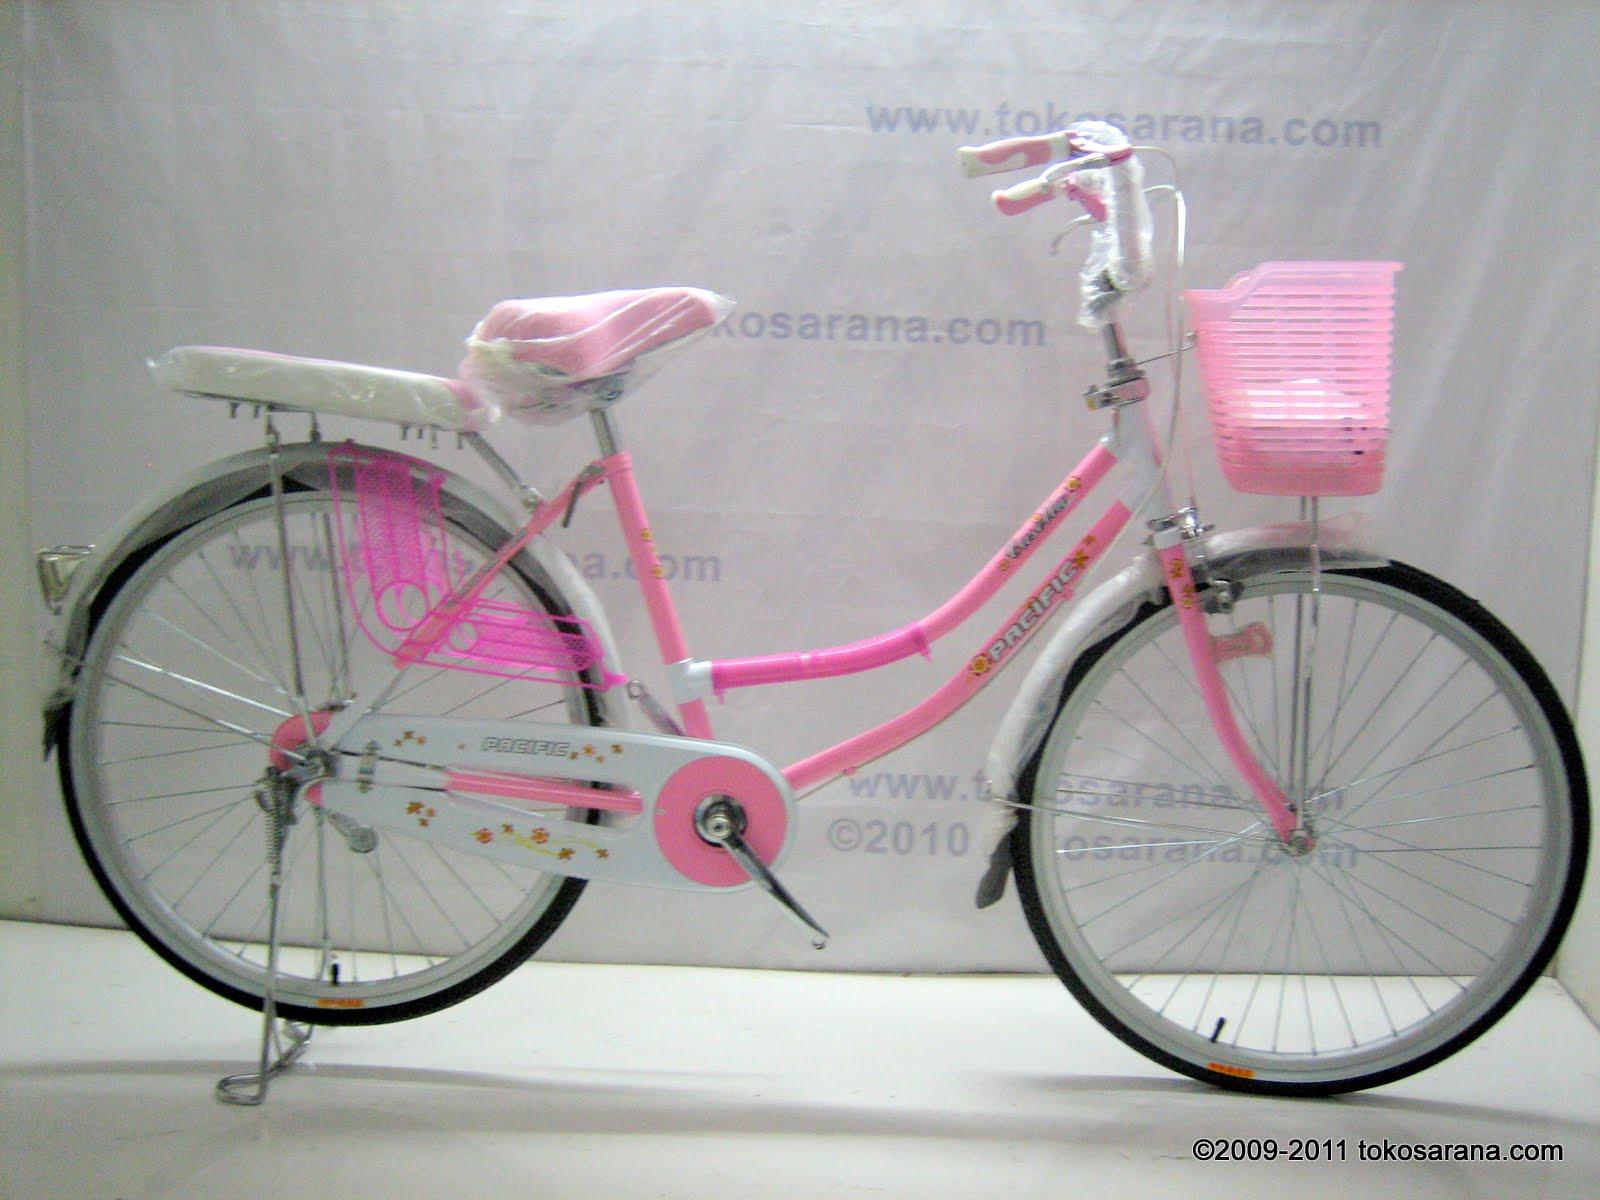 tokosarana™ | Mahasarana Sukses™: Sepeda Mini Pacific